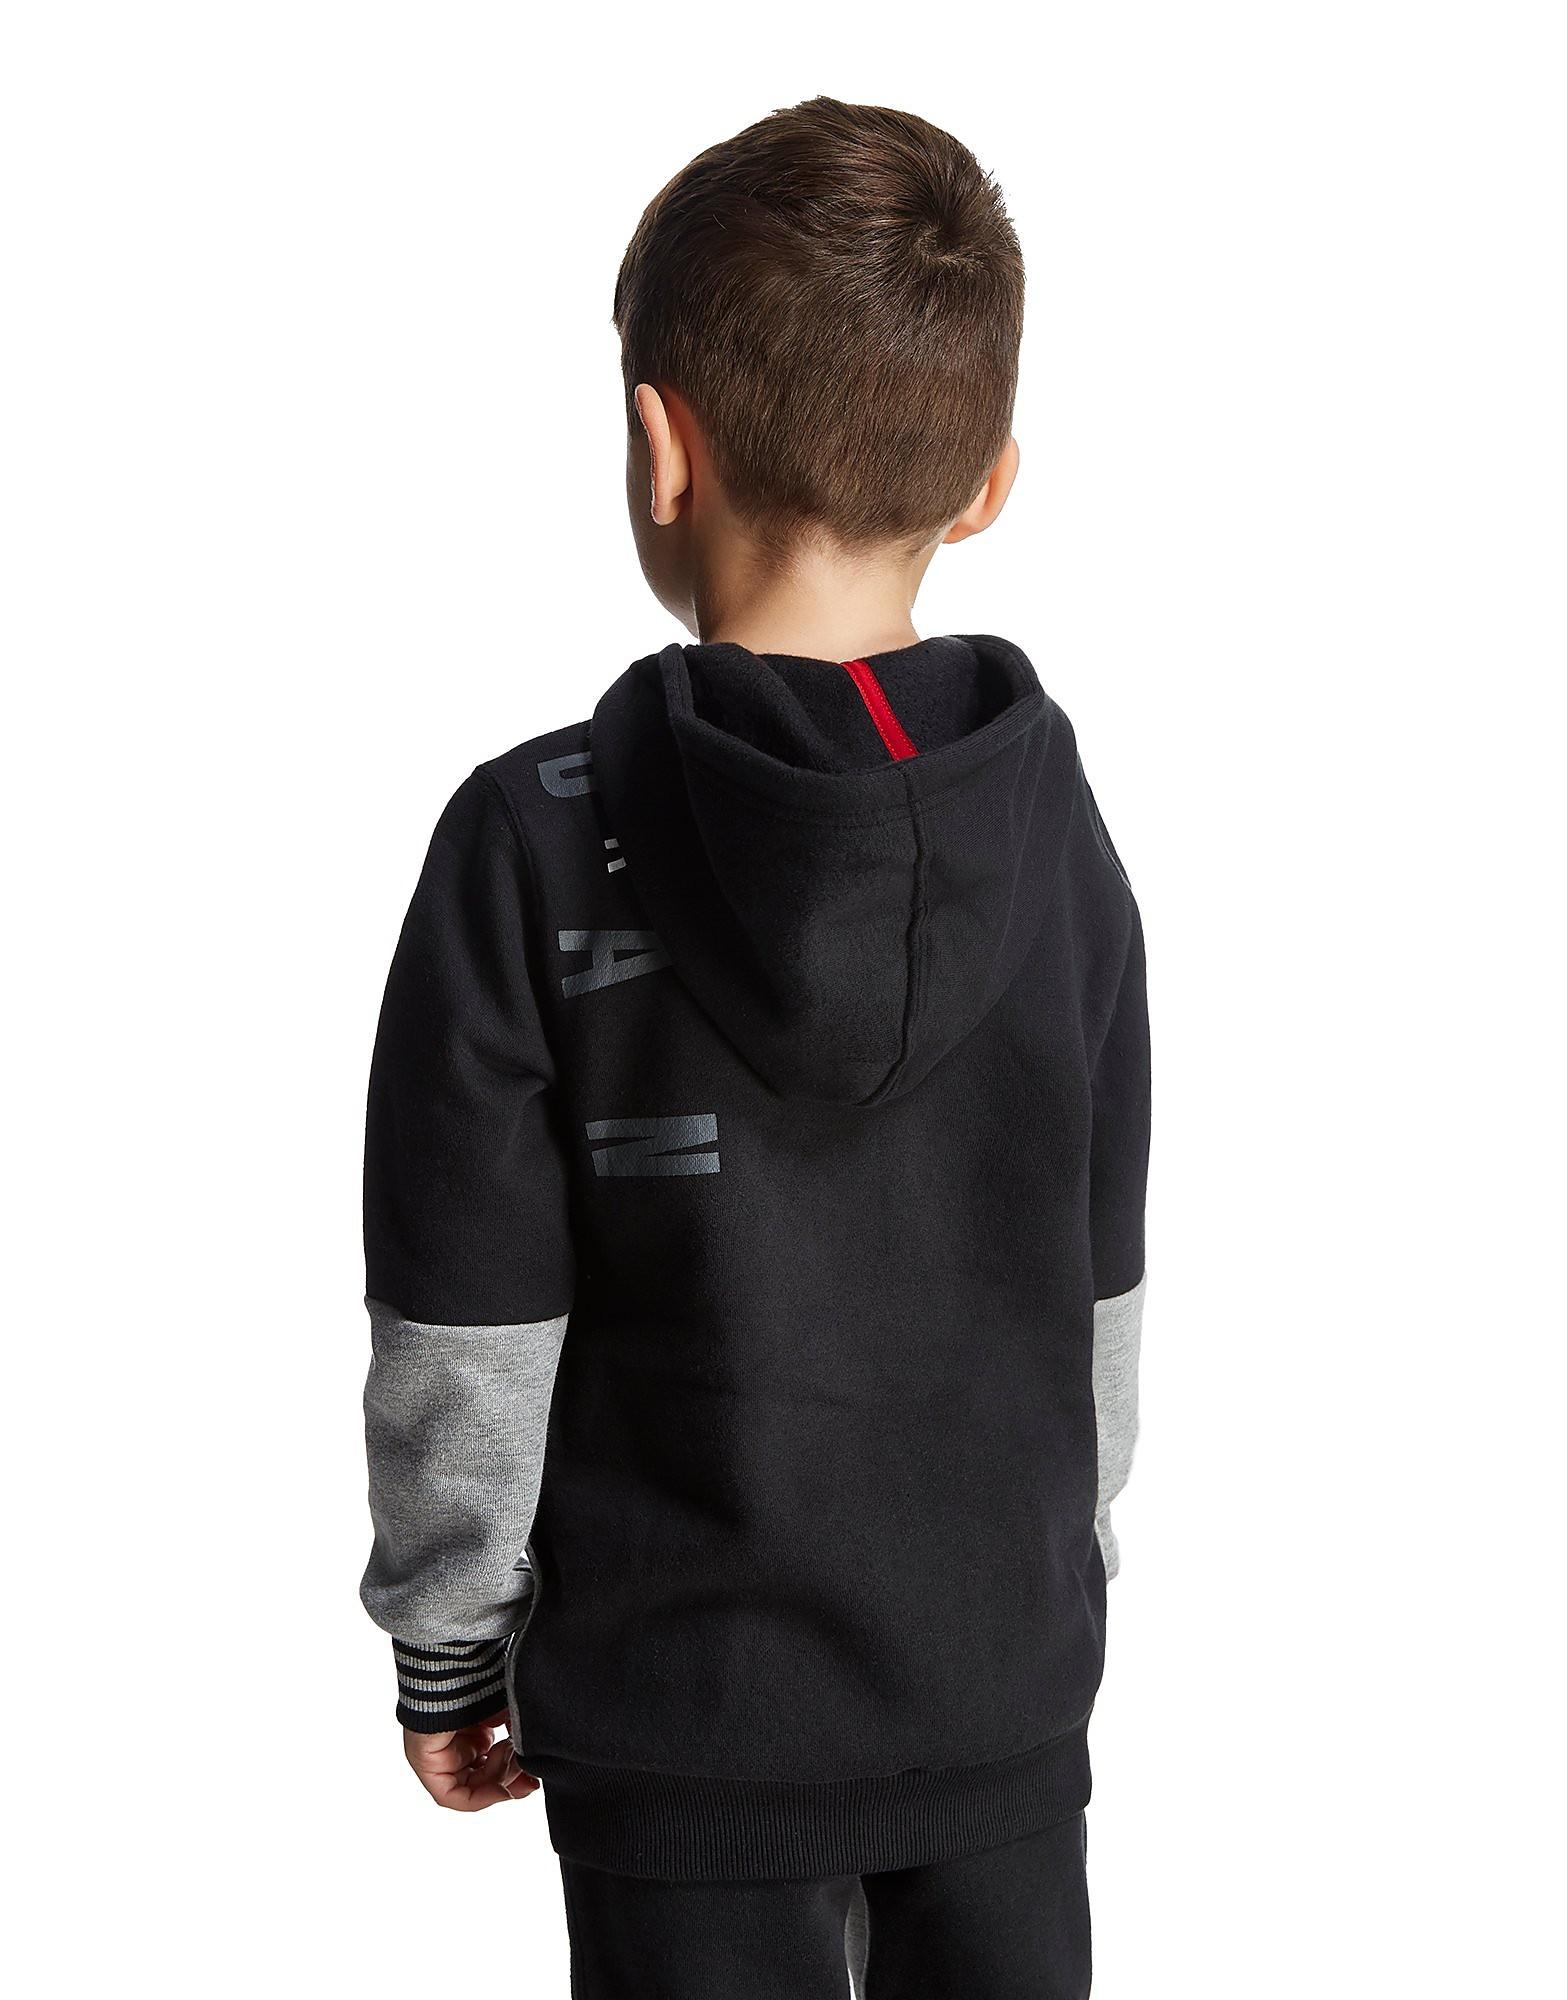 Jordan Sudadera con capucha Free Extended para niño